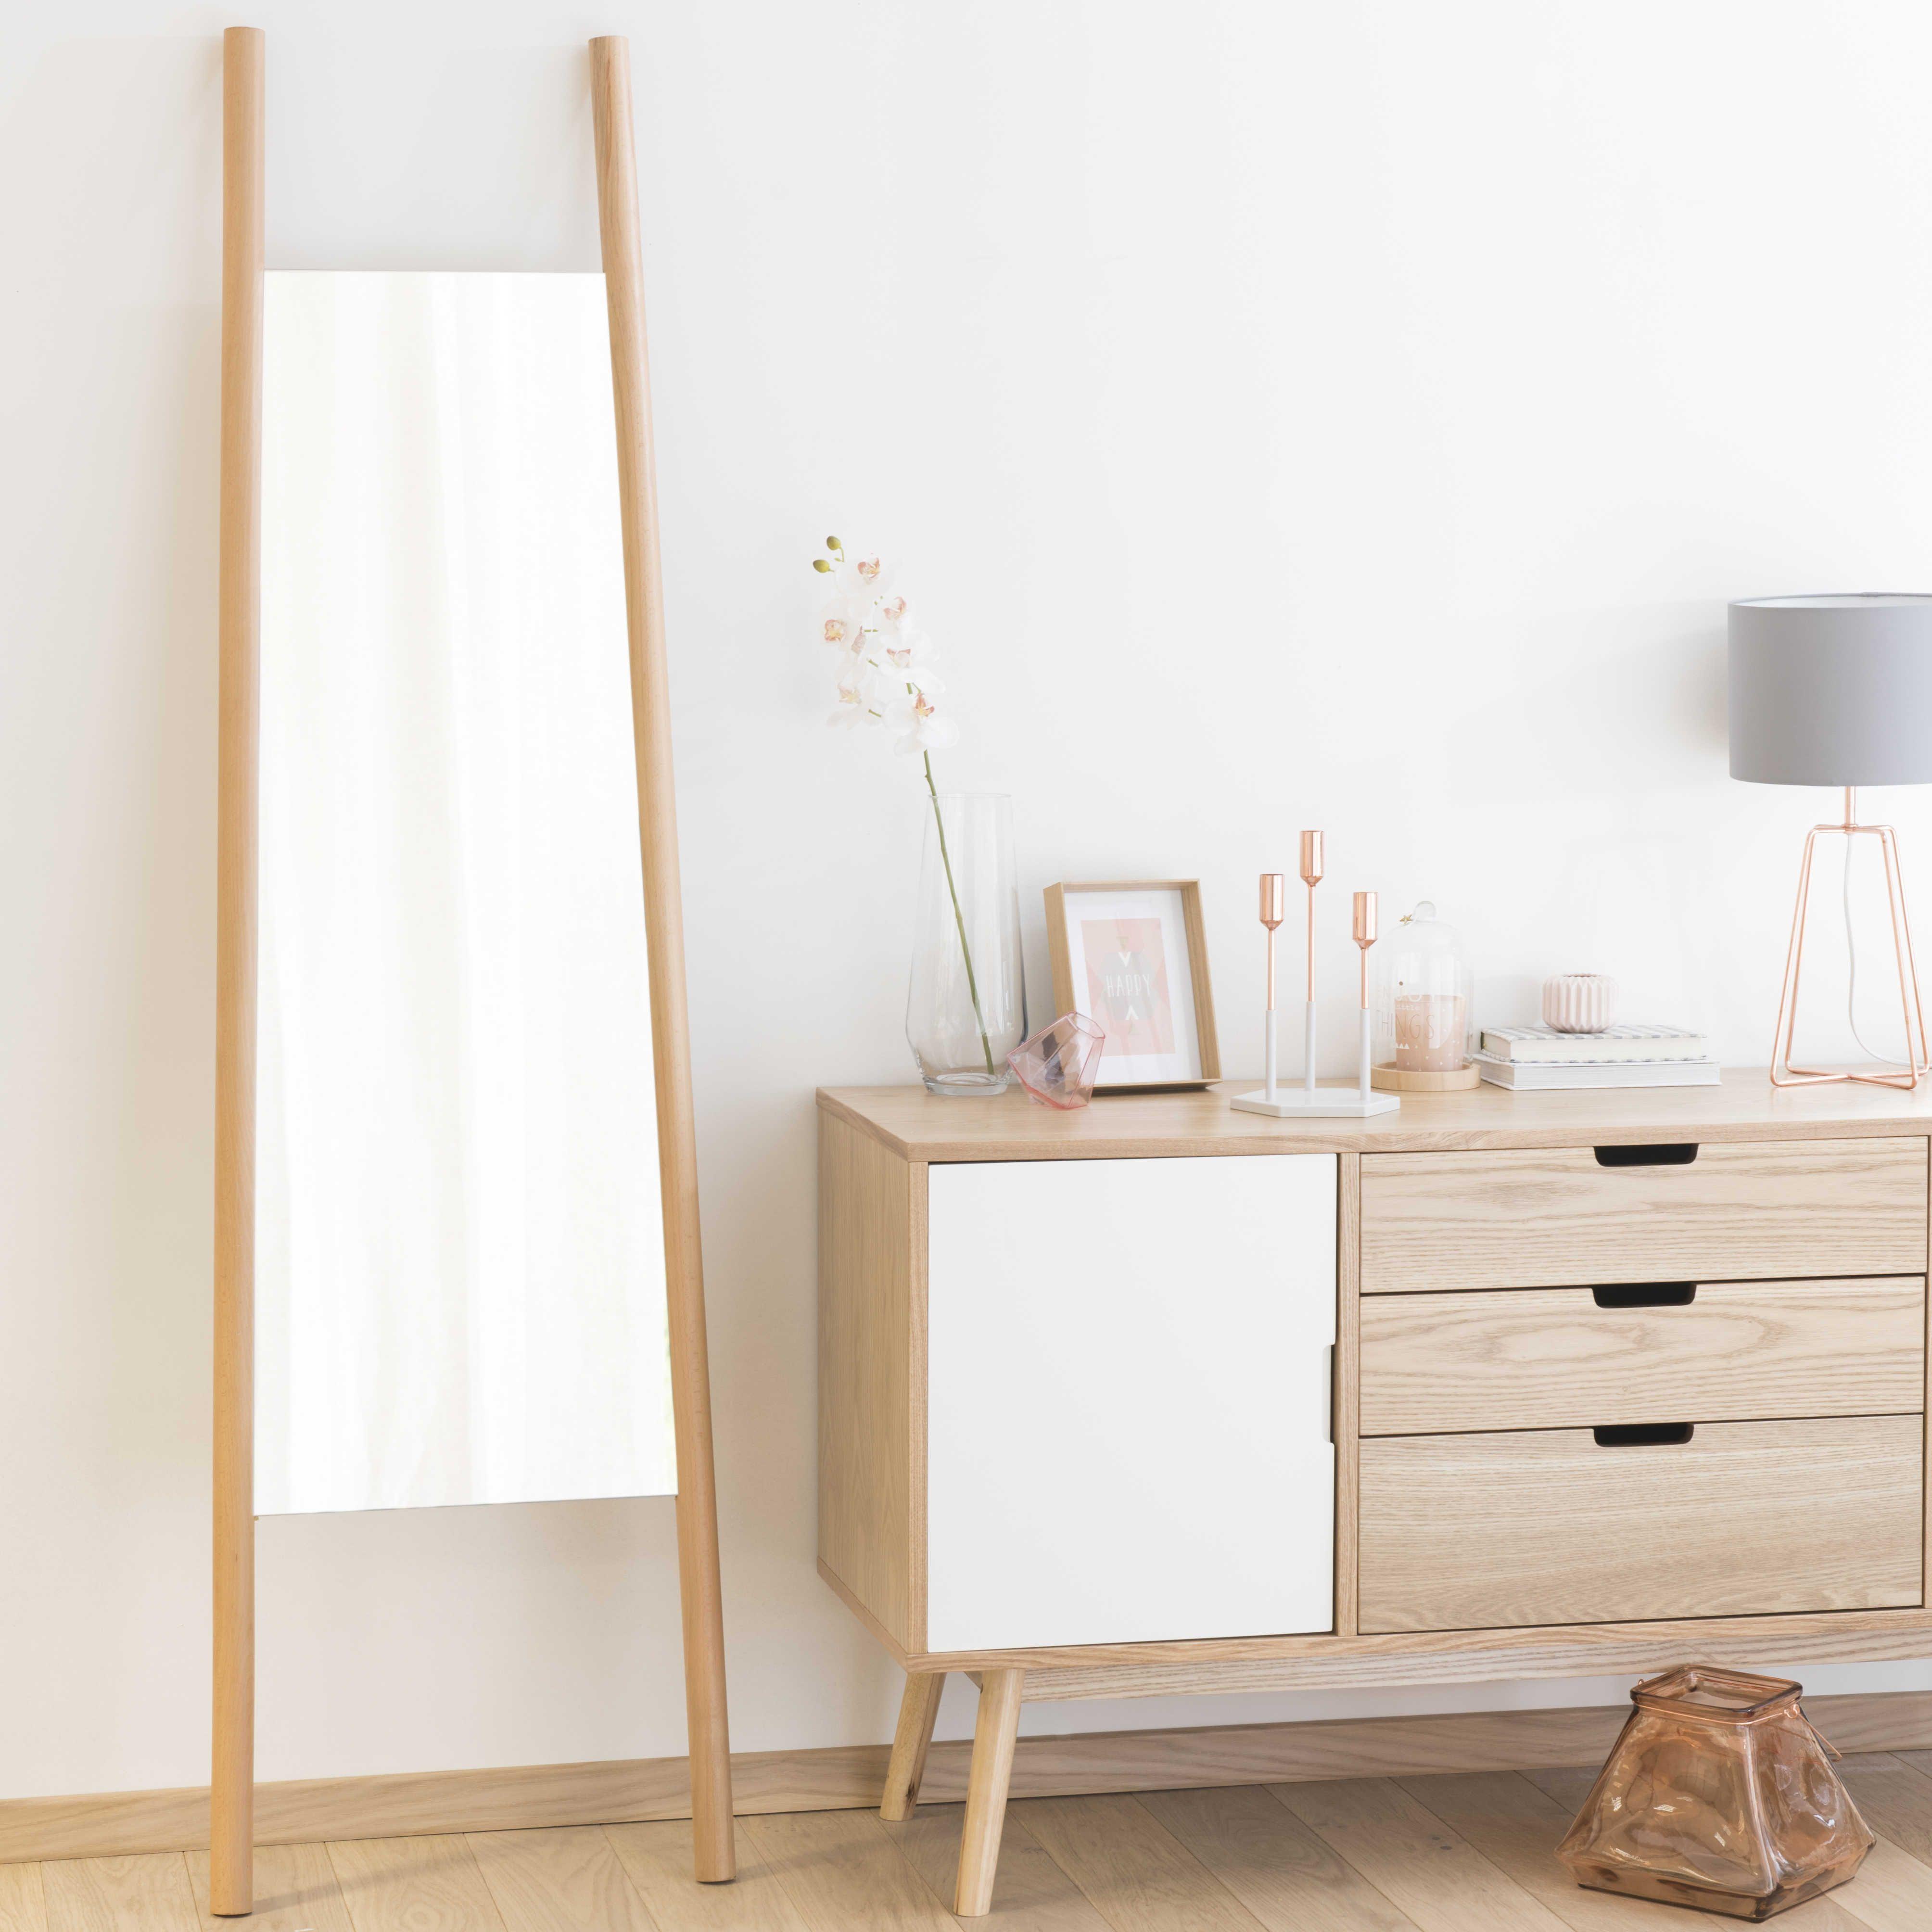 spiegel tussen twee houten staanders hoogte 180 cm. Black Bedroom Furniture Sets. Home Design Ideas